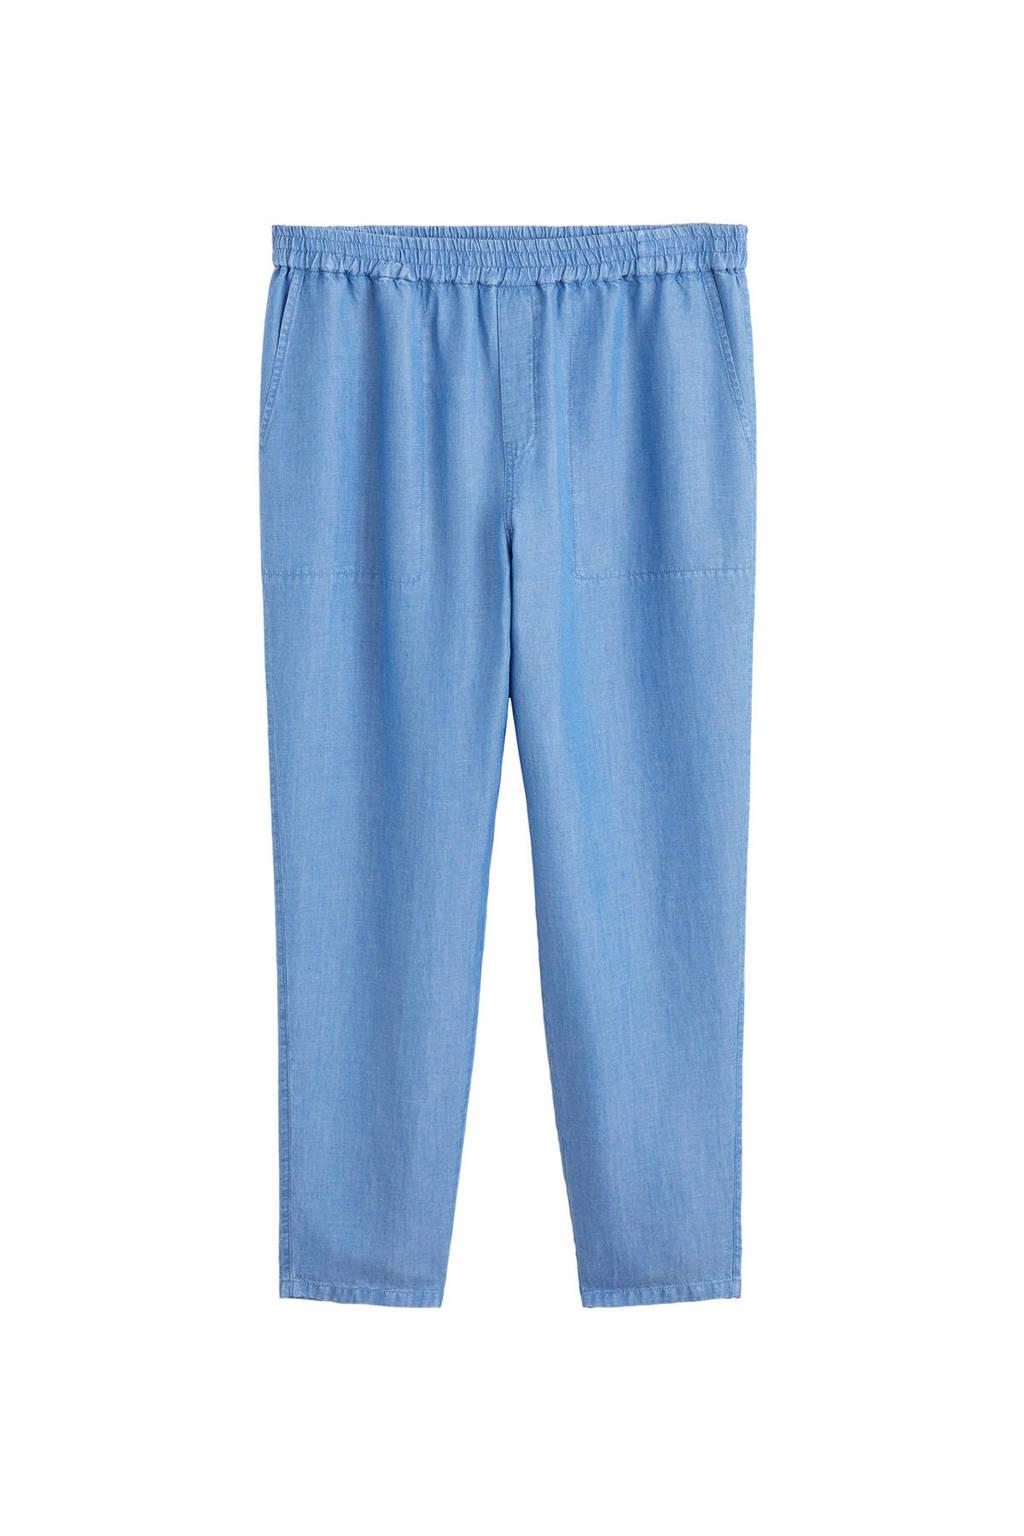 Violeta by Mango high waist loose fit broek met linnen light denim, Light denim